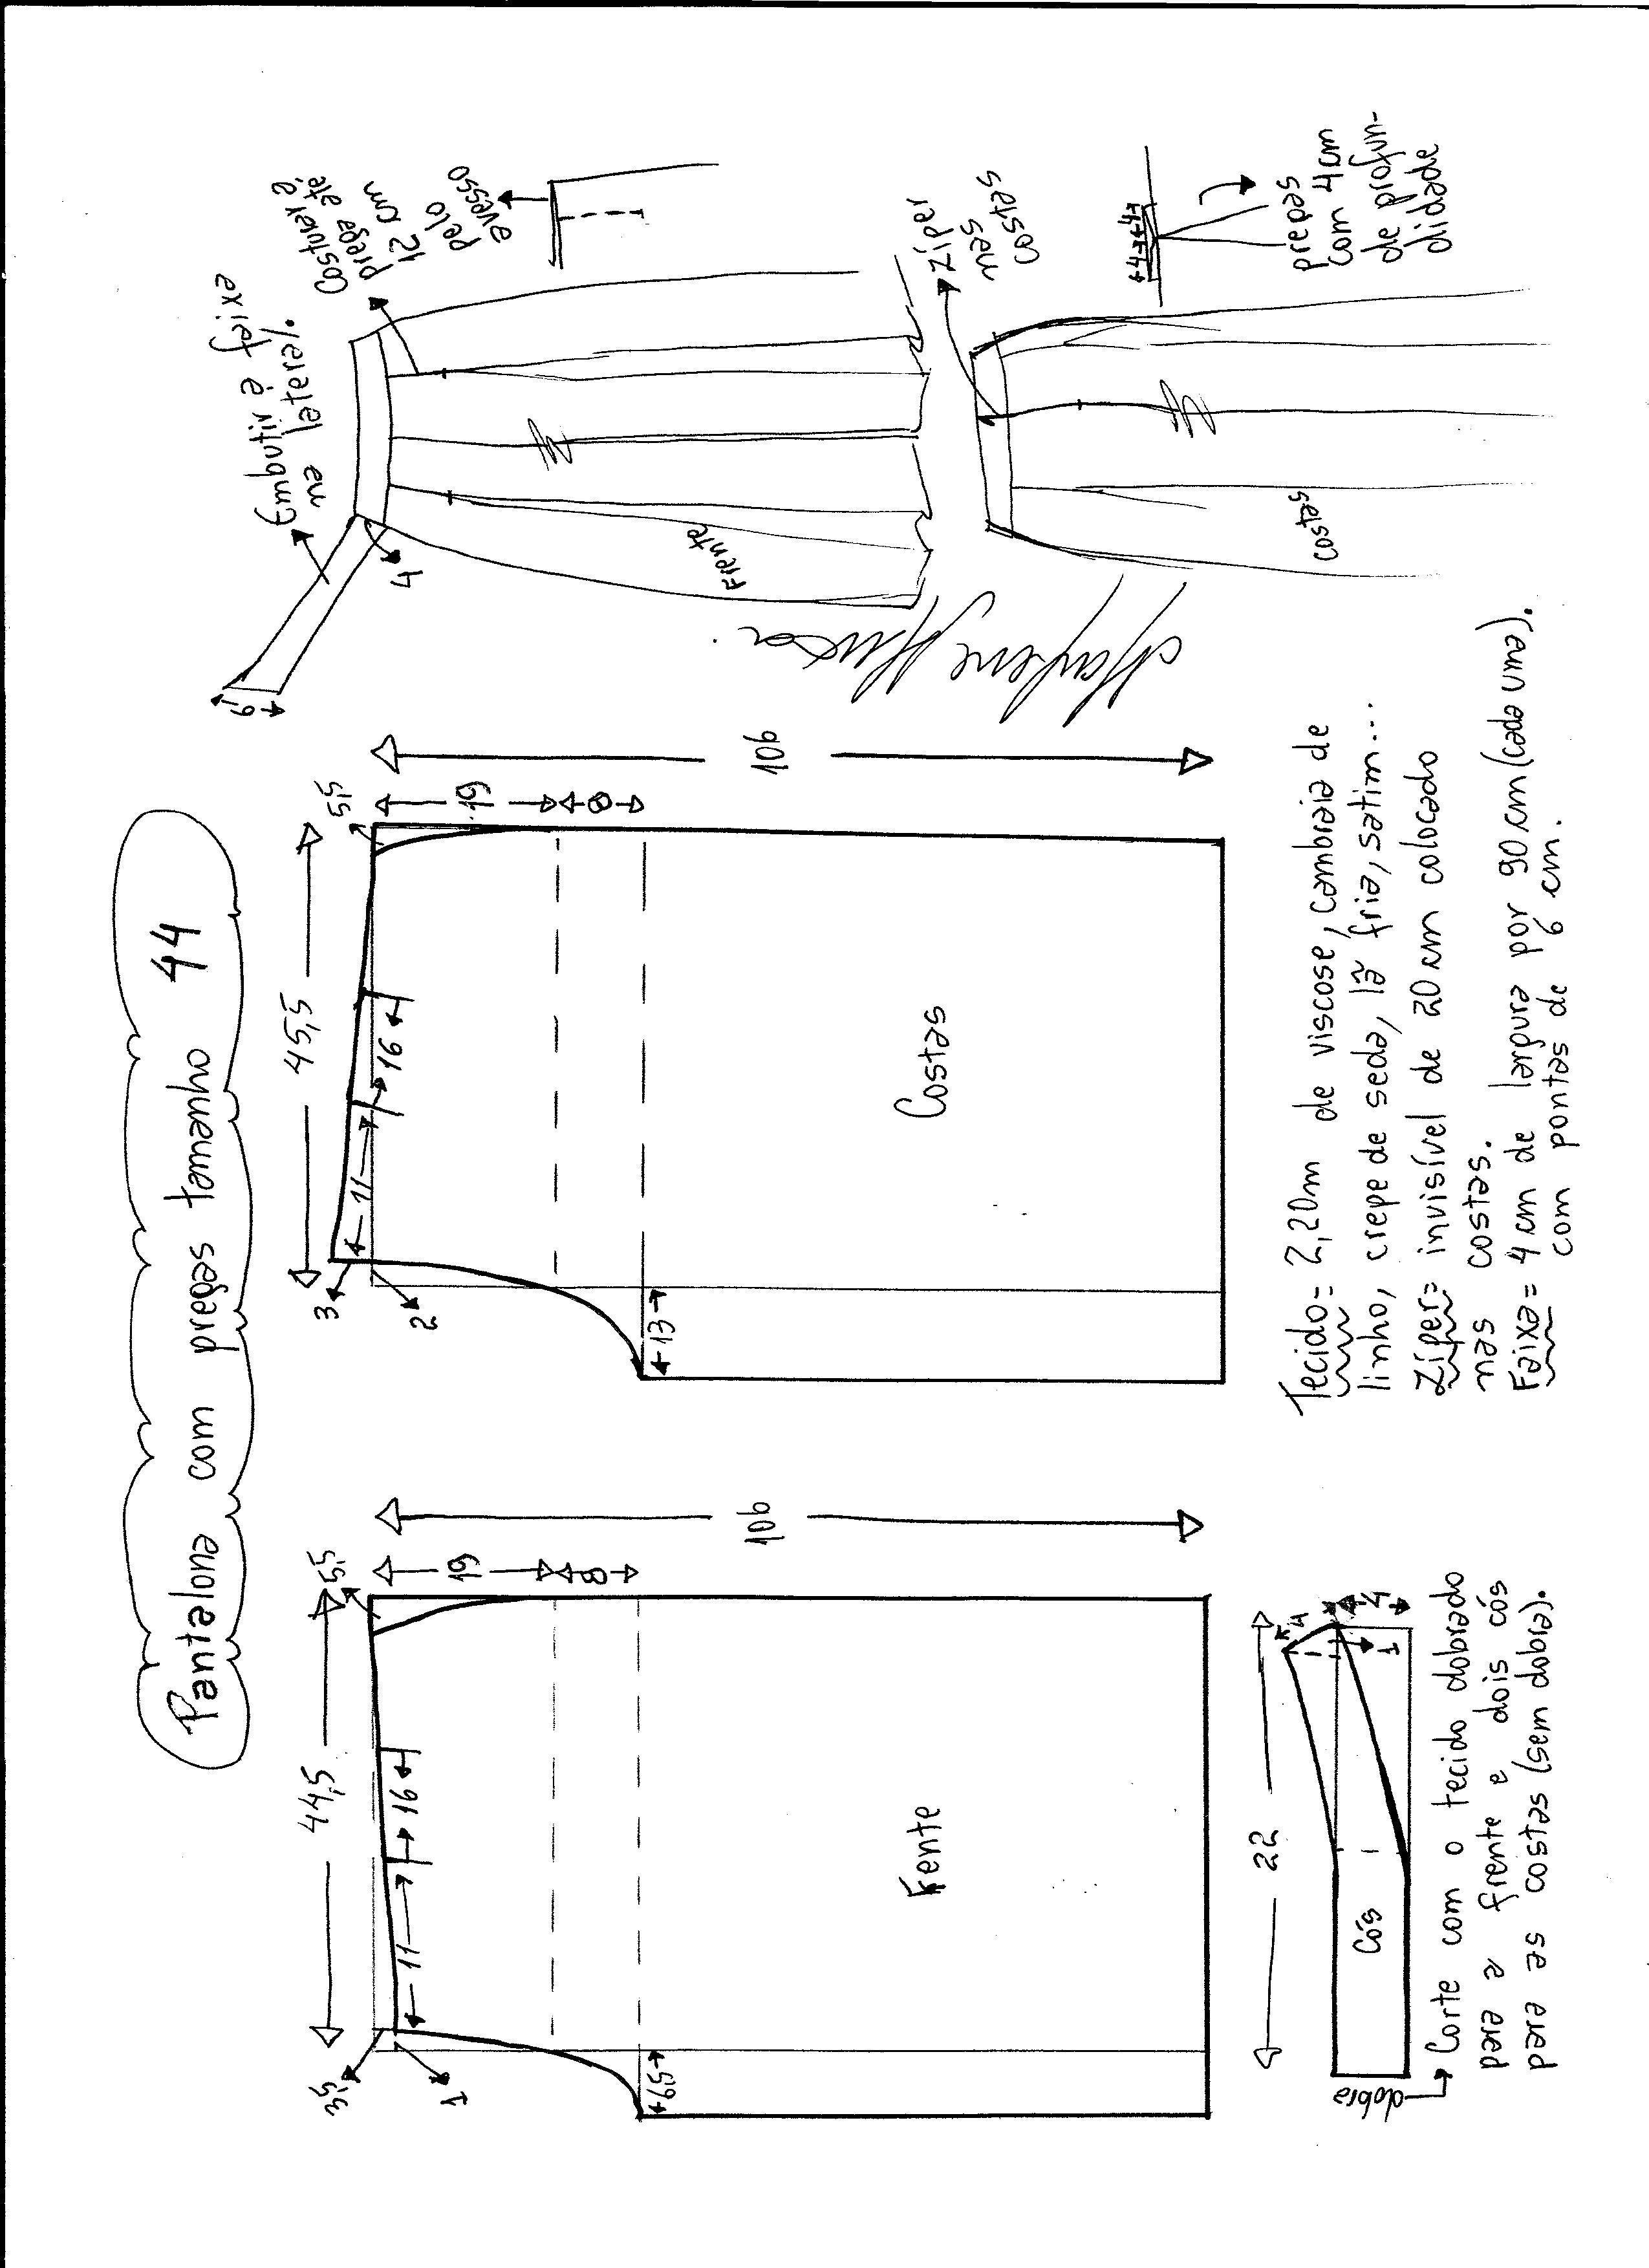 Calça Pantalona com pregas | Costura, Molde y Patrones